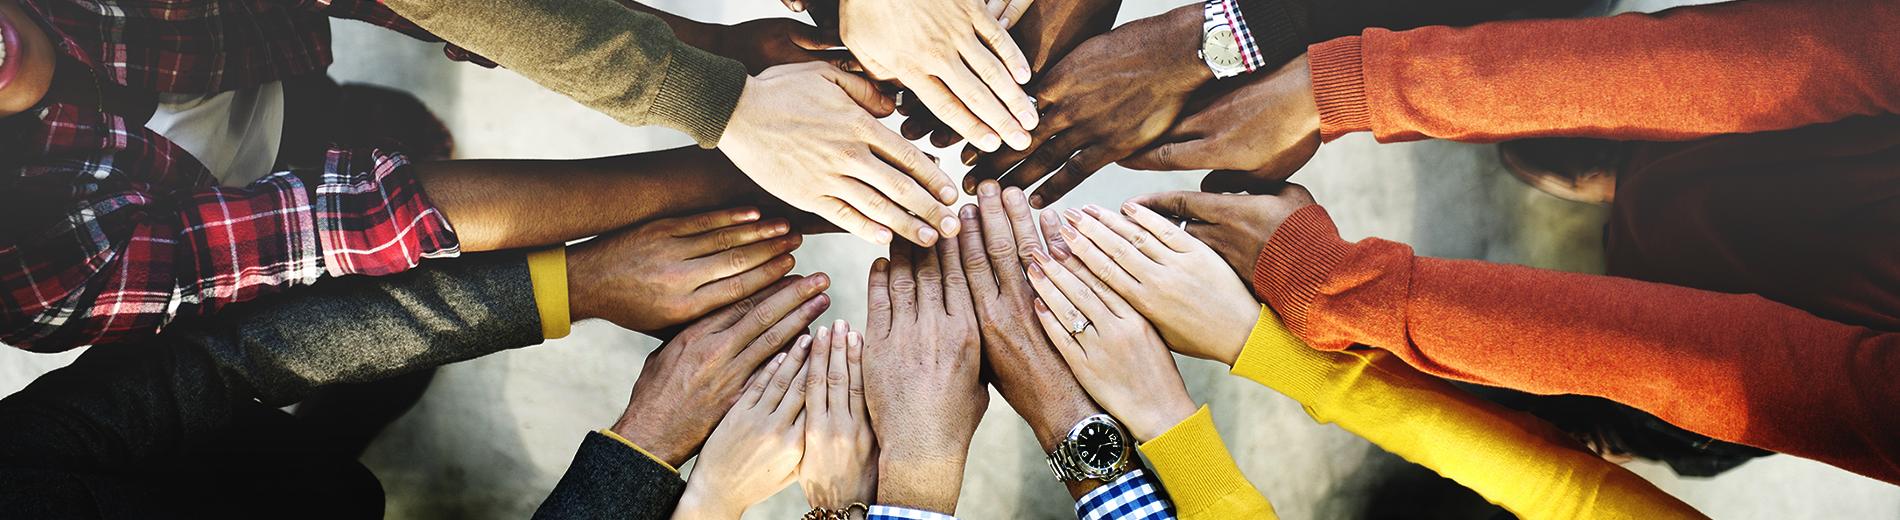 photo shows diversity